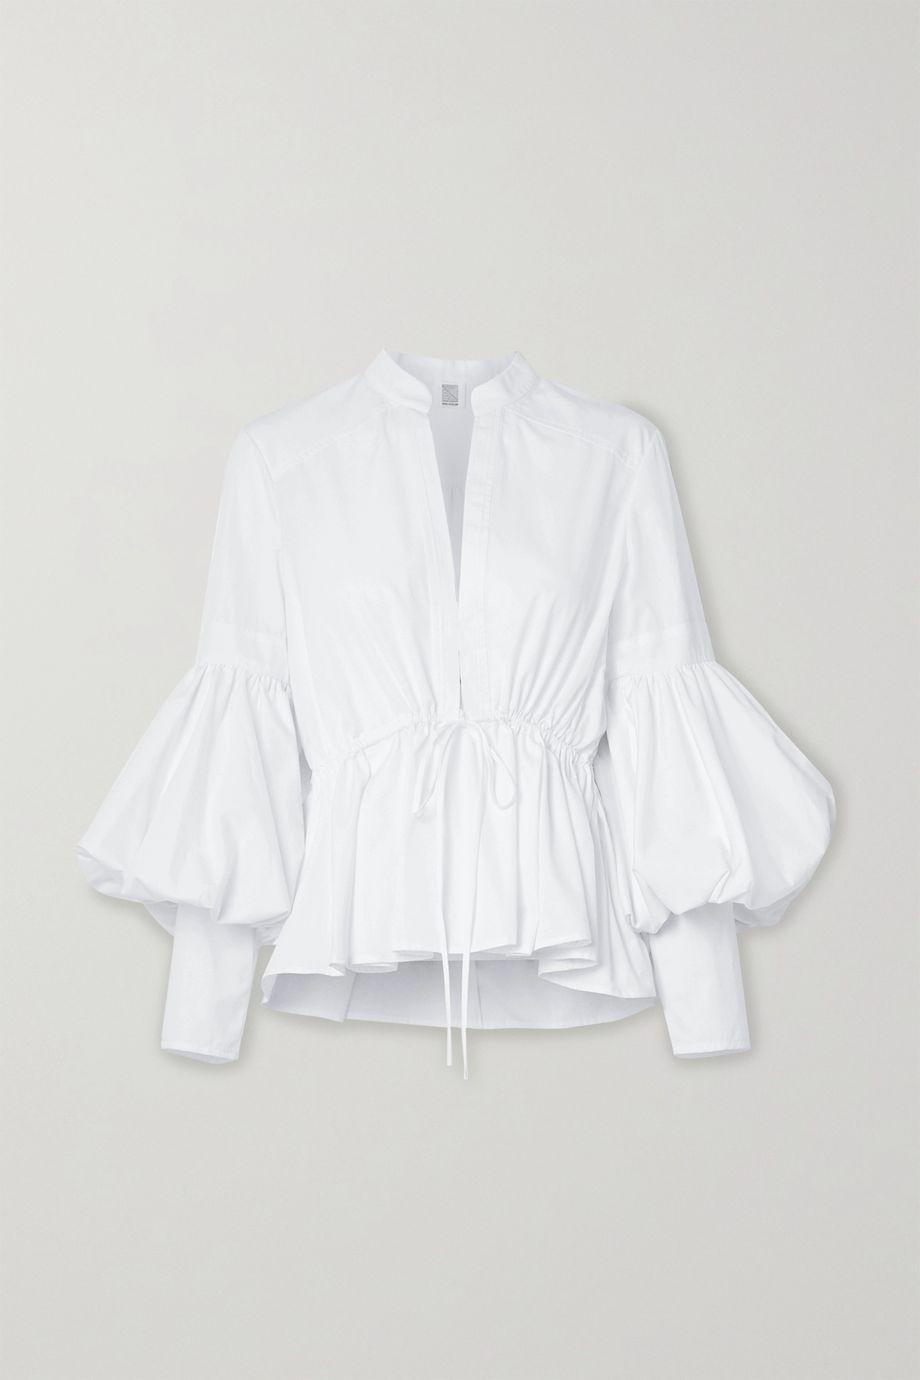 Rosie Assoulin Lantern oversized cotton-blend poplin peplum blouse